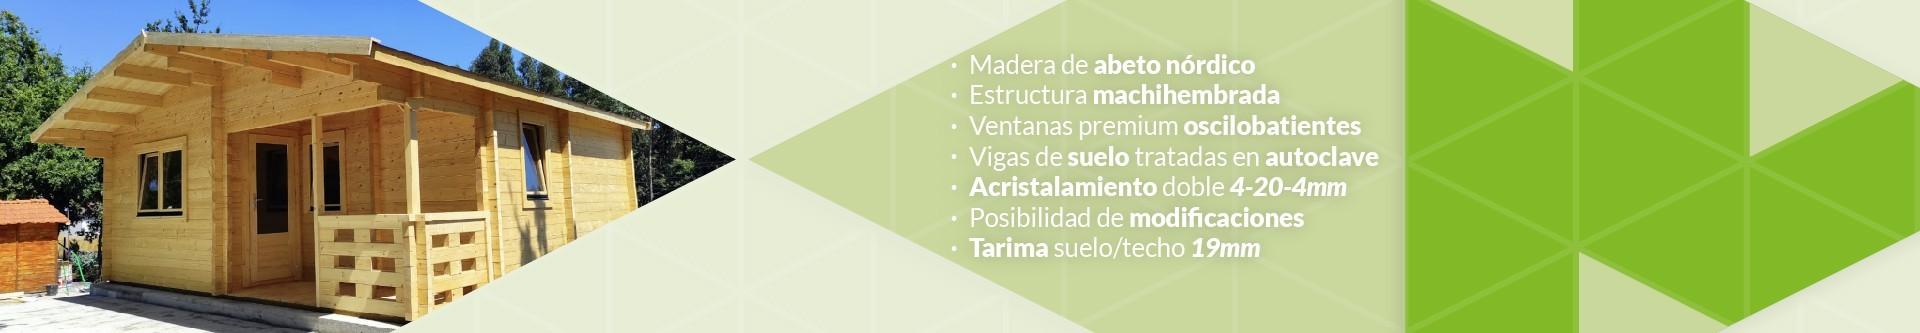 Casas de madera | Cabañas de madera | Bungalows prefabricados